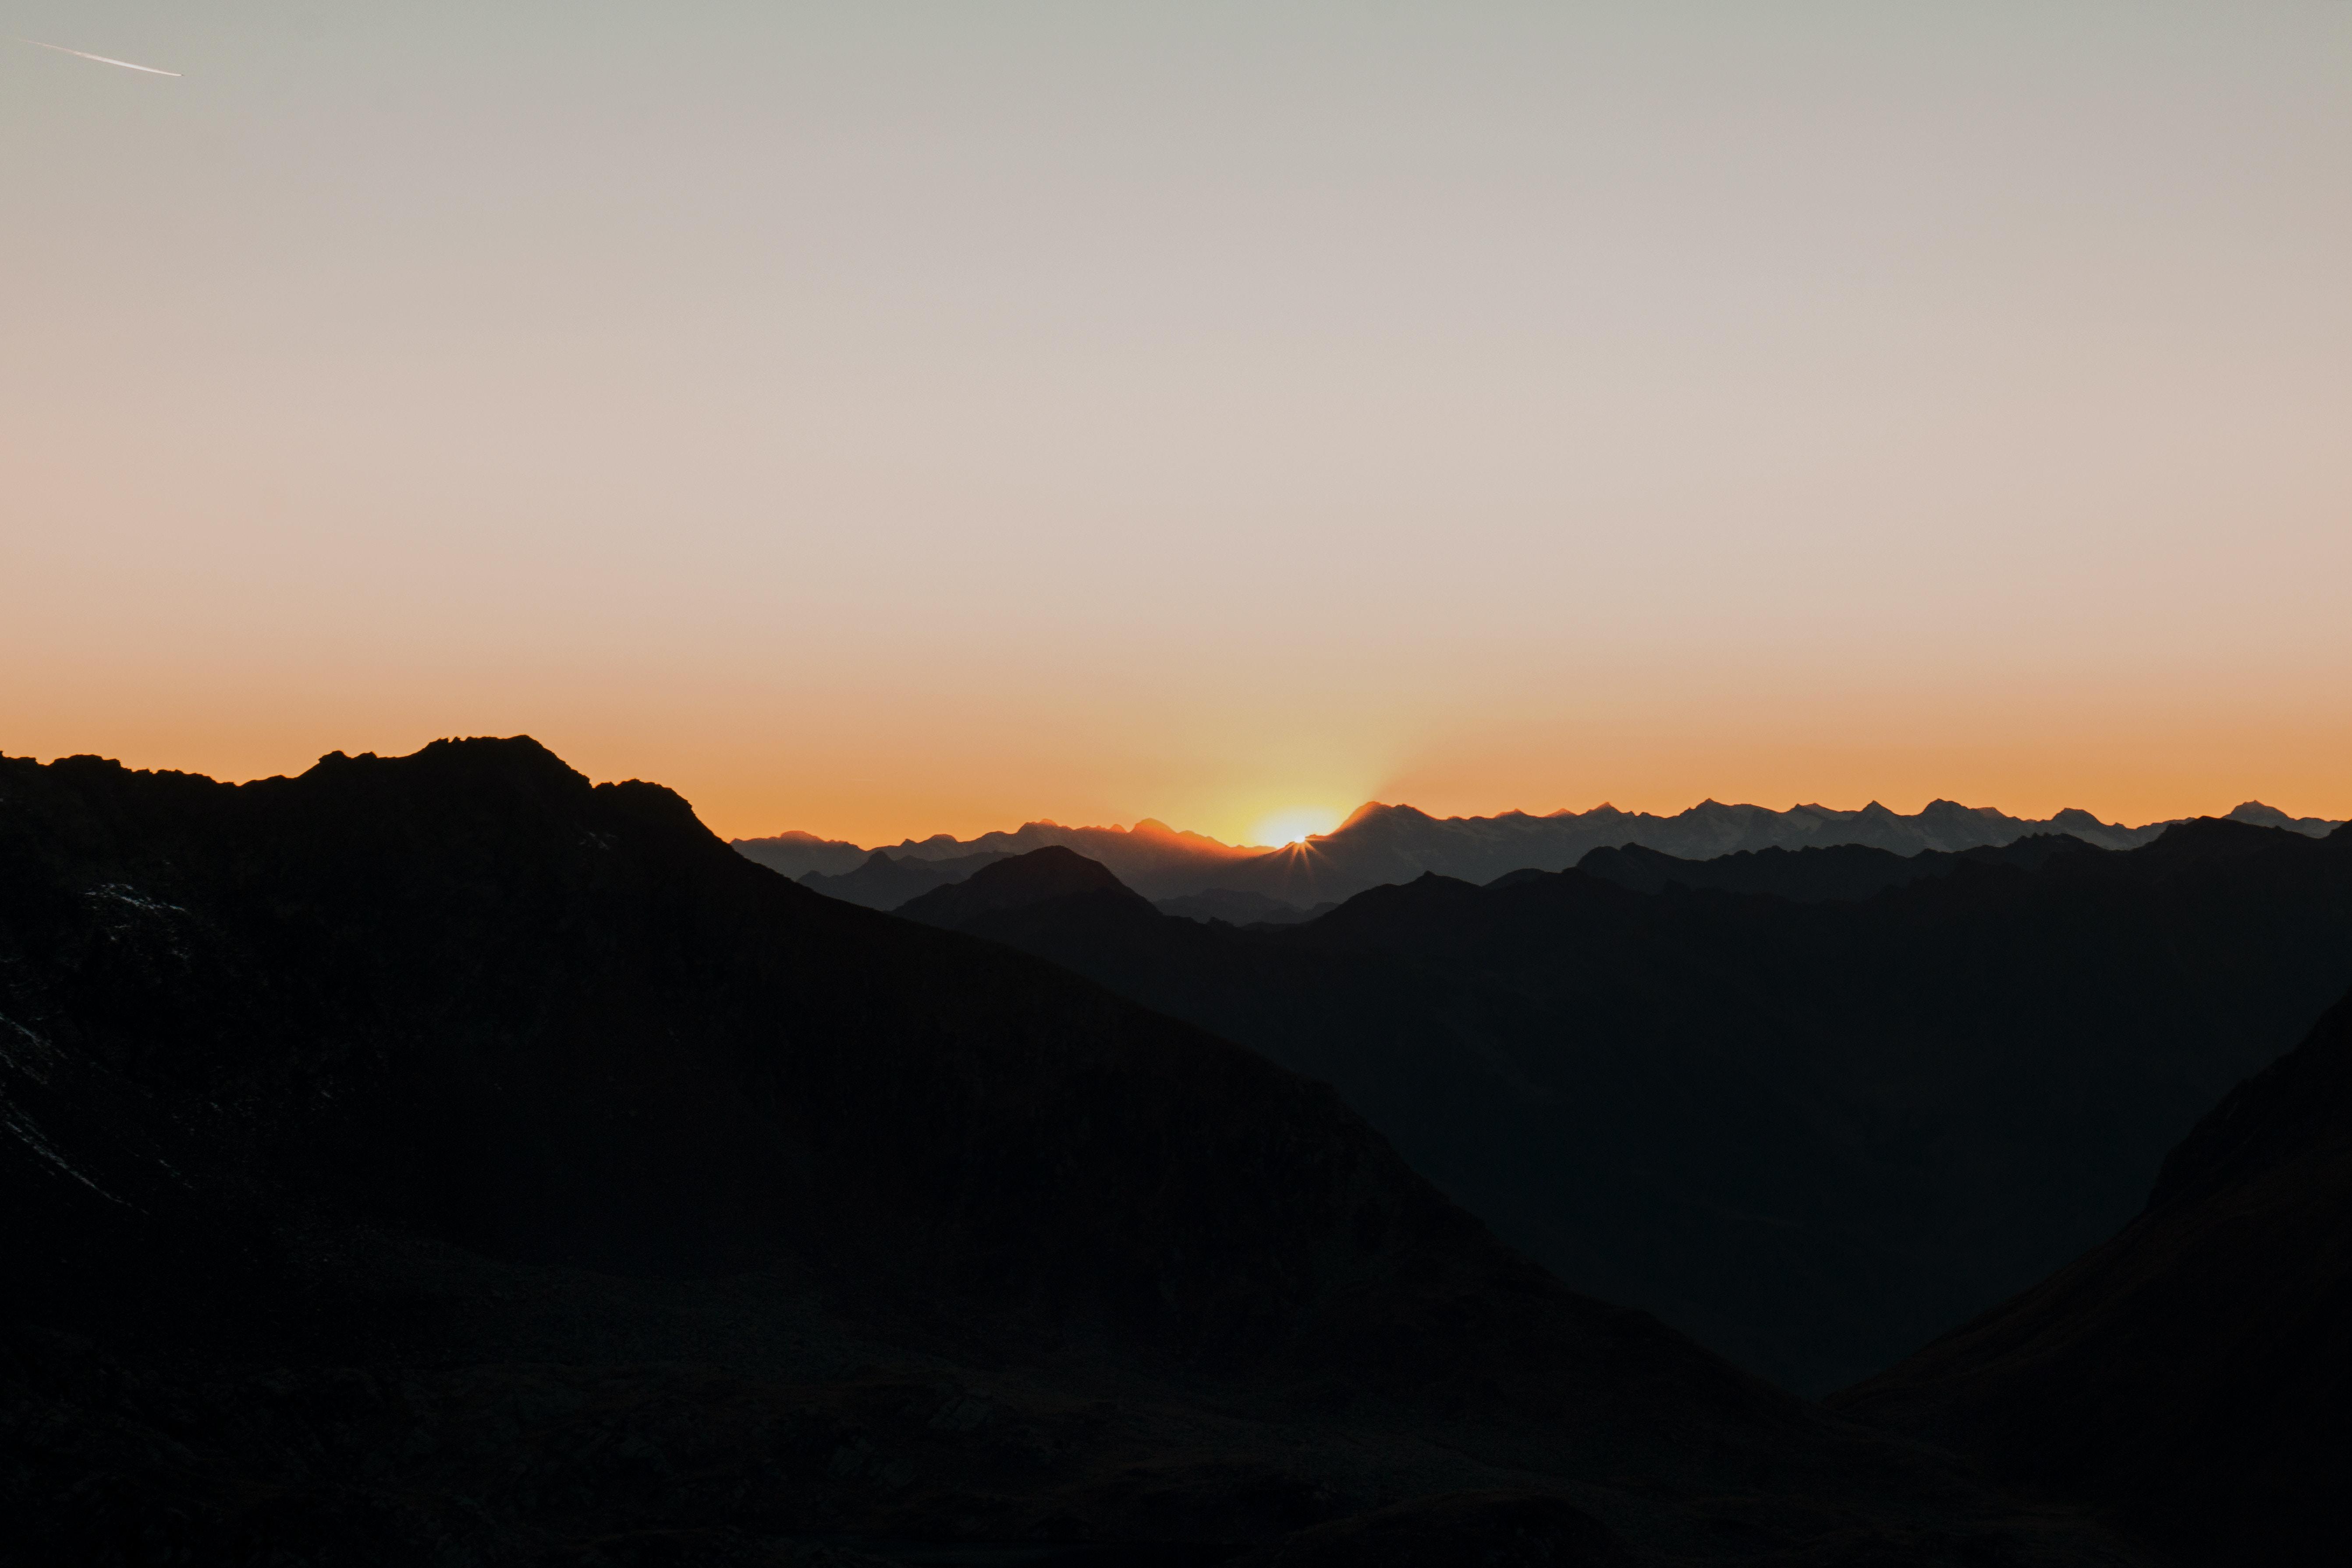 bird eye view photography of golden hour